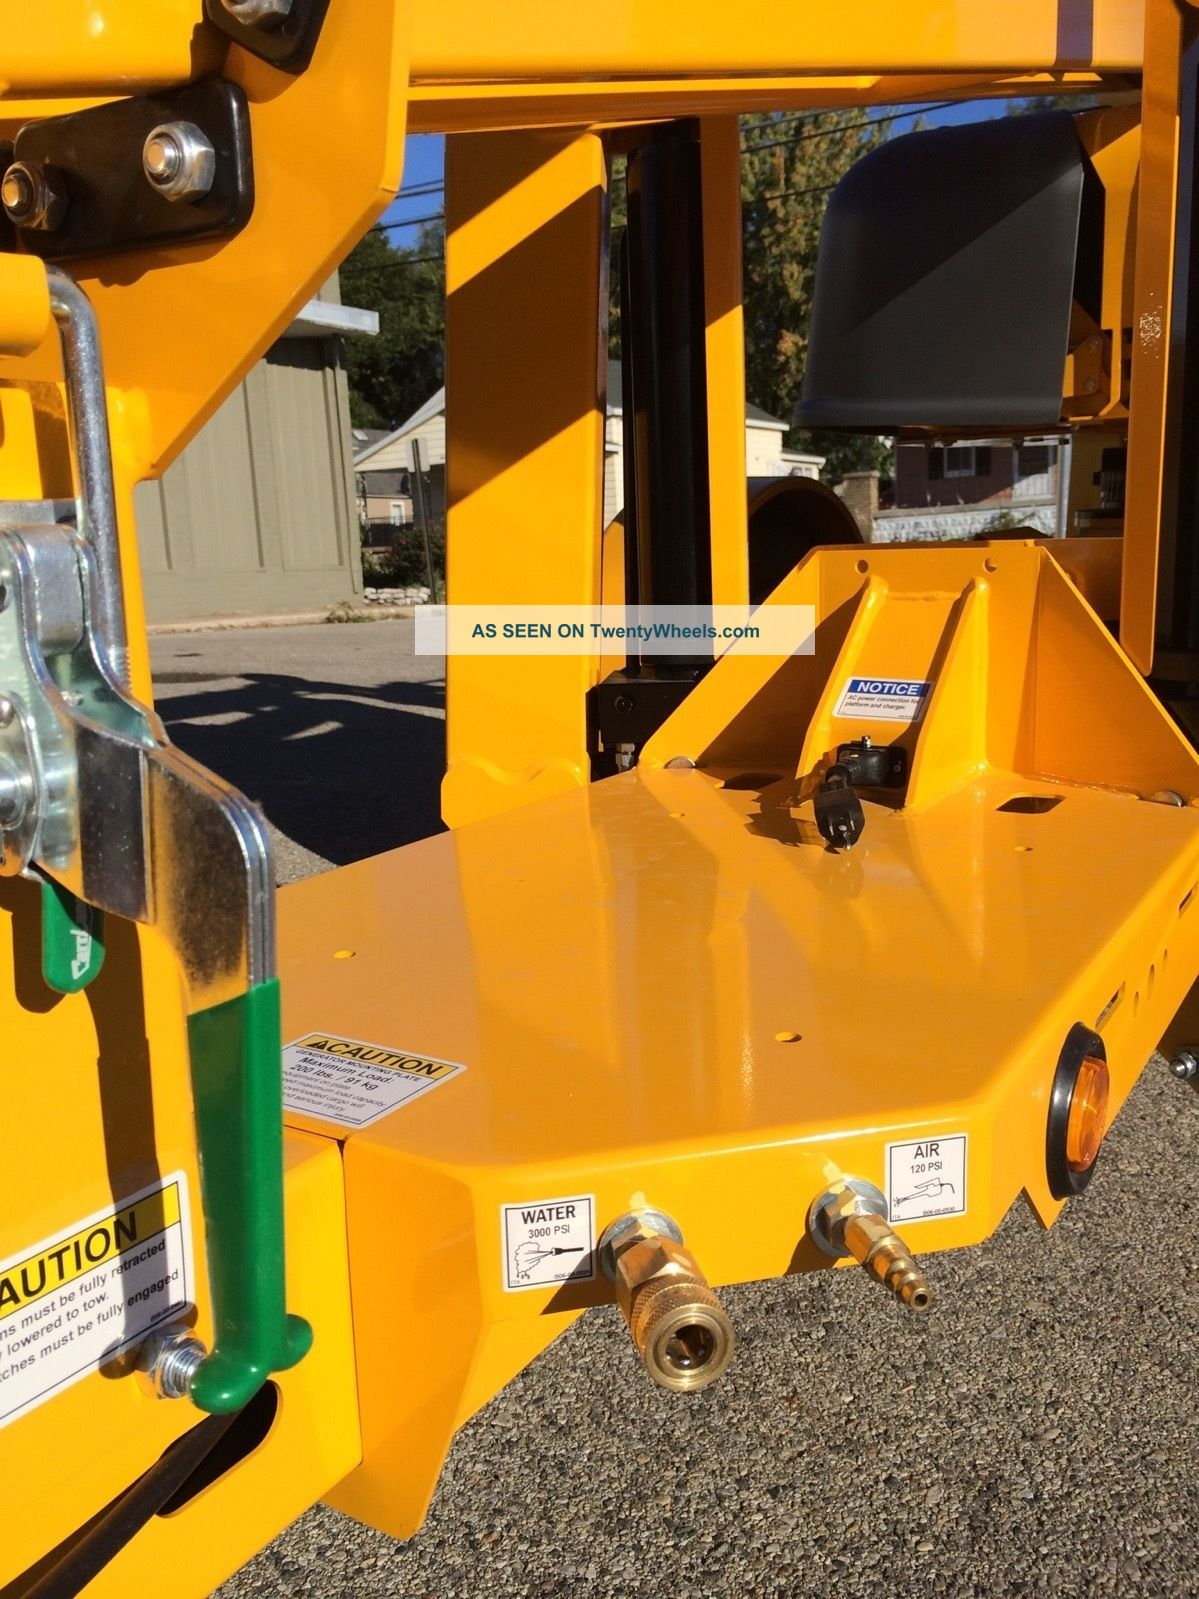 2017 Bil - Jax 3522a Towable Boom Lift Man 43' Height Unit, Made In Usa